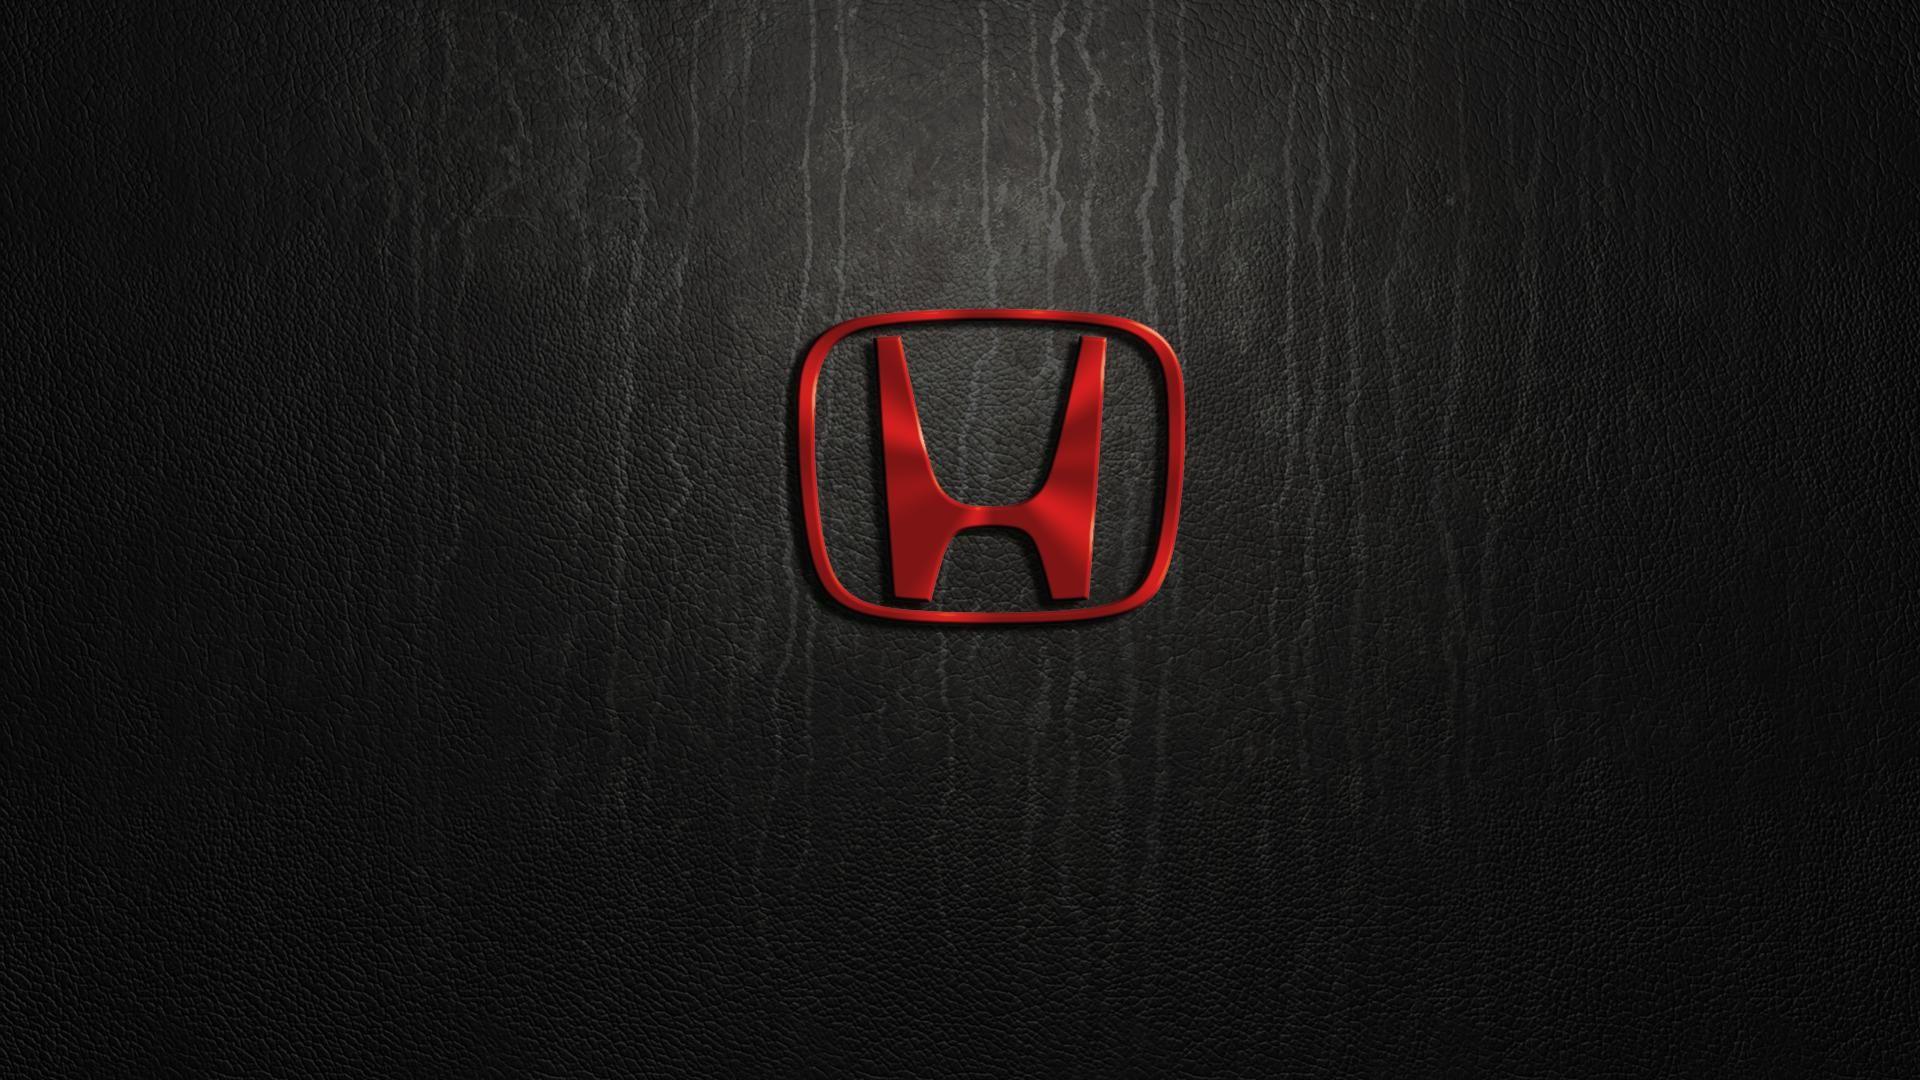 Honda Logo Wallpapers Wallpaper In 2019 Honda Logo Honda